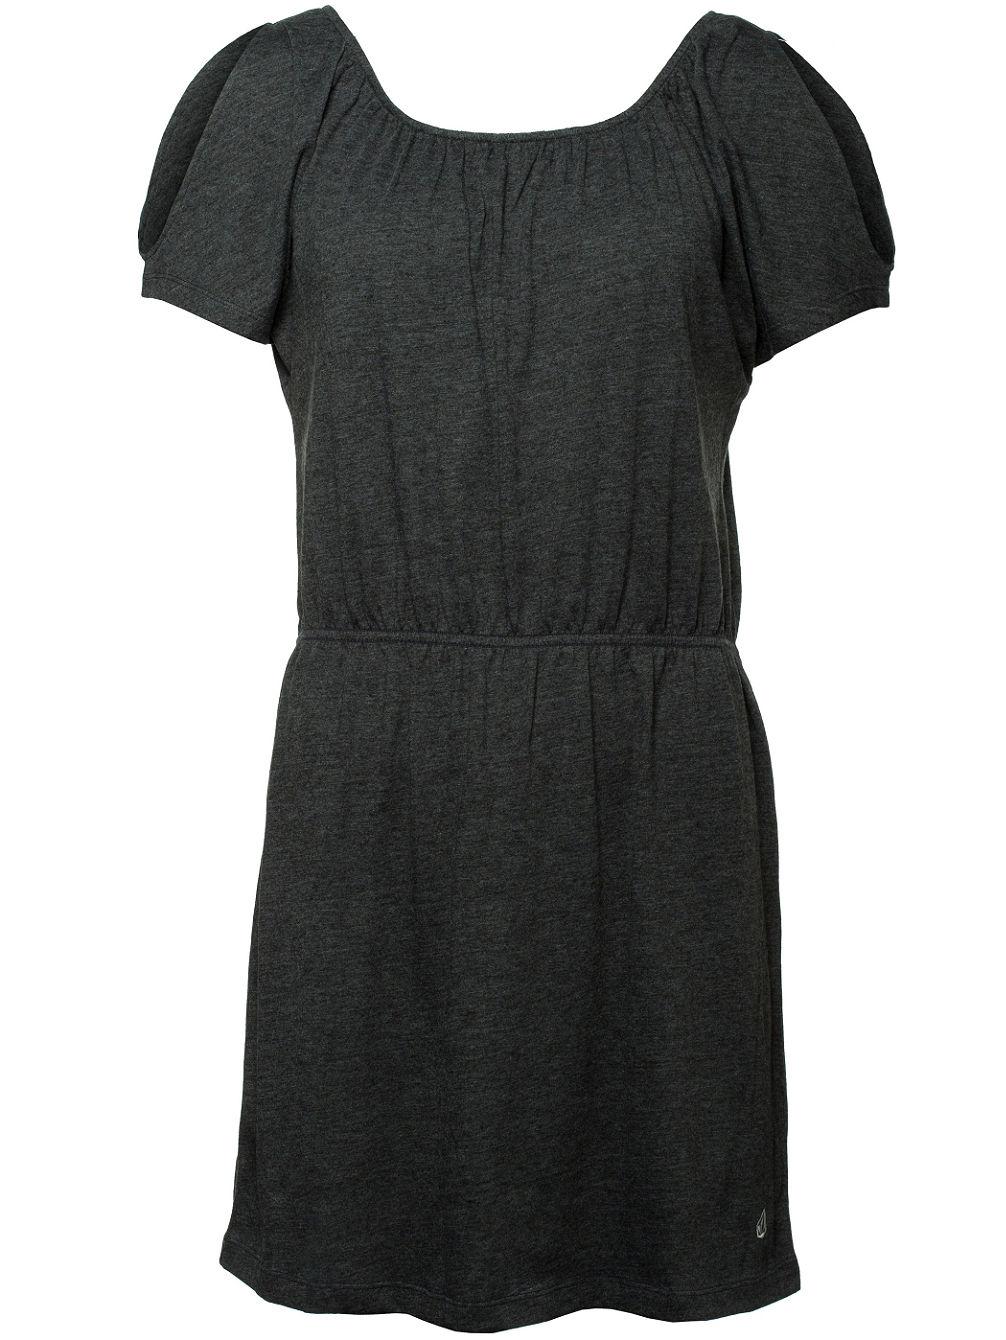 Volcom Simply Stone Dress